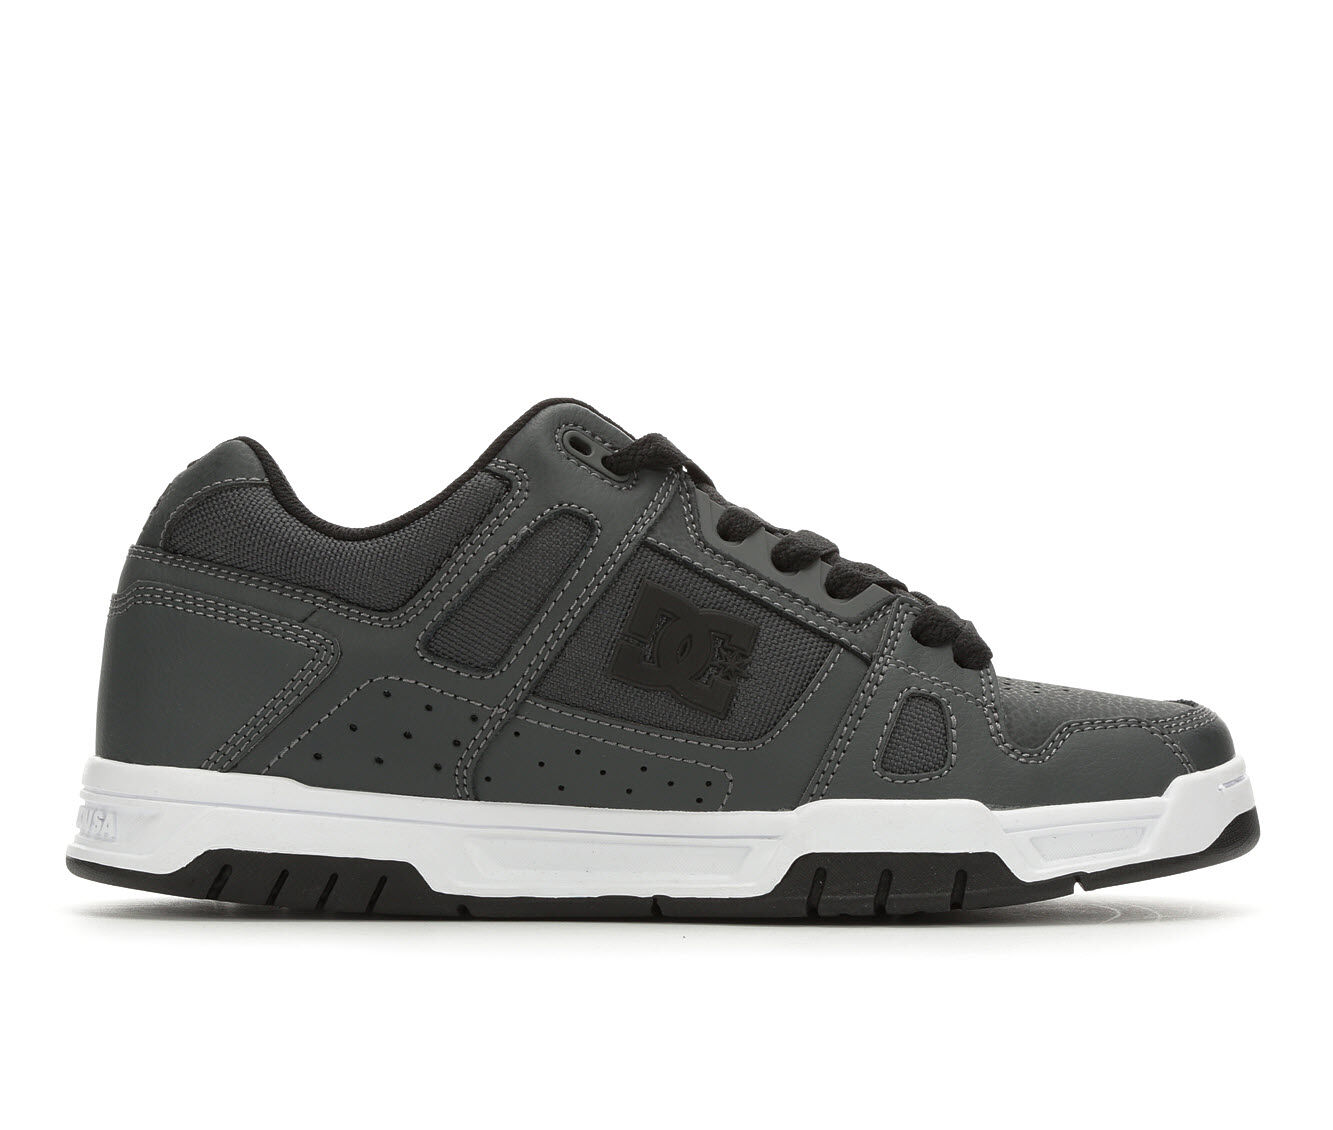 shop authentic new style Men's DC Stag Skate Shoes Dk Grey